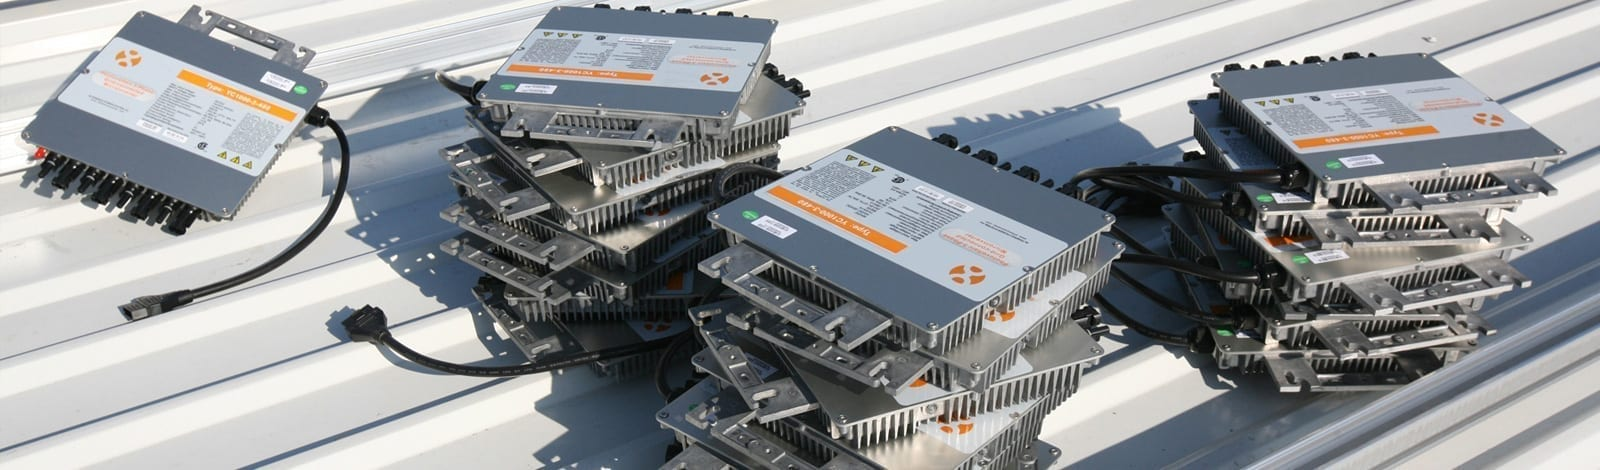 apsystems-slider2015-a